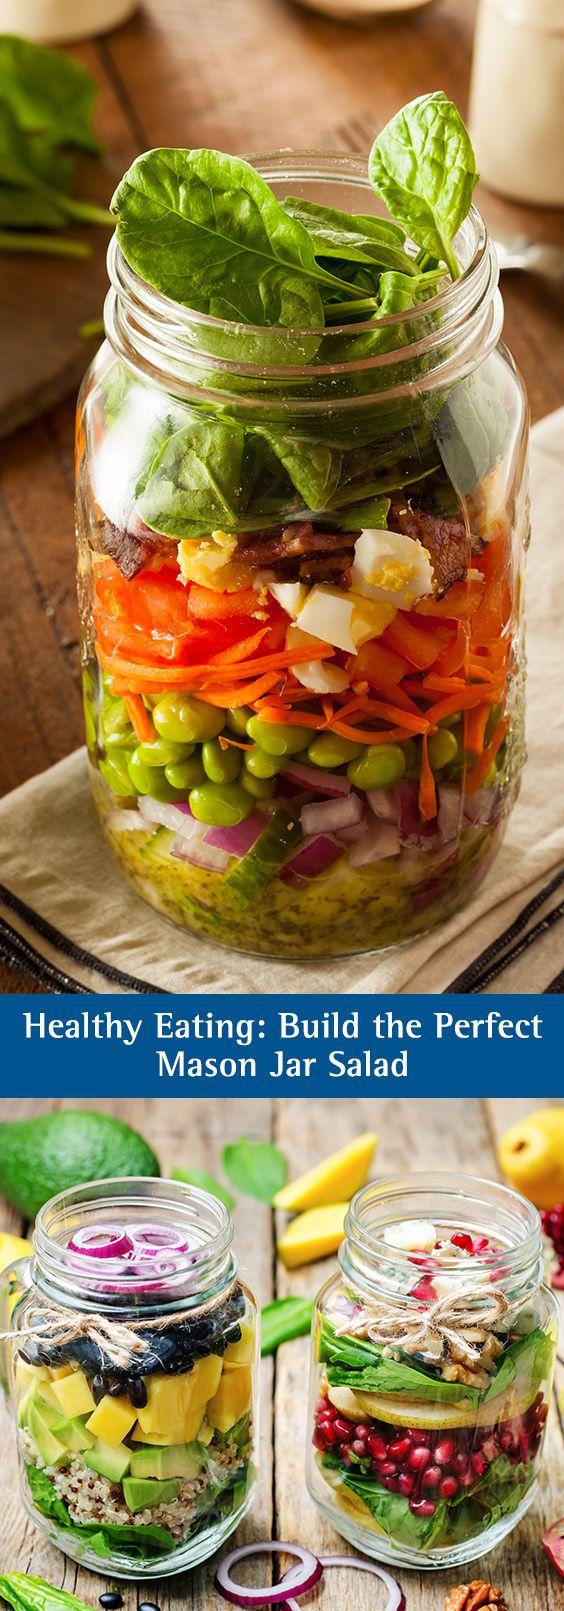 Healthy Eating: Build the Perfect Mason Jar Salad. Healthy salad recipe, easy to make, quick recipe.